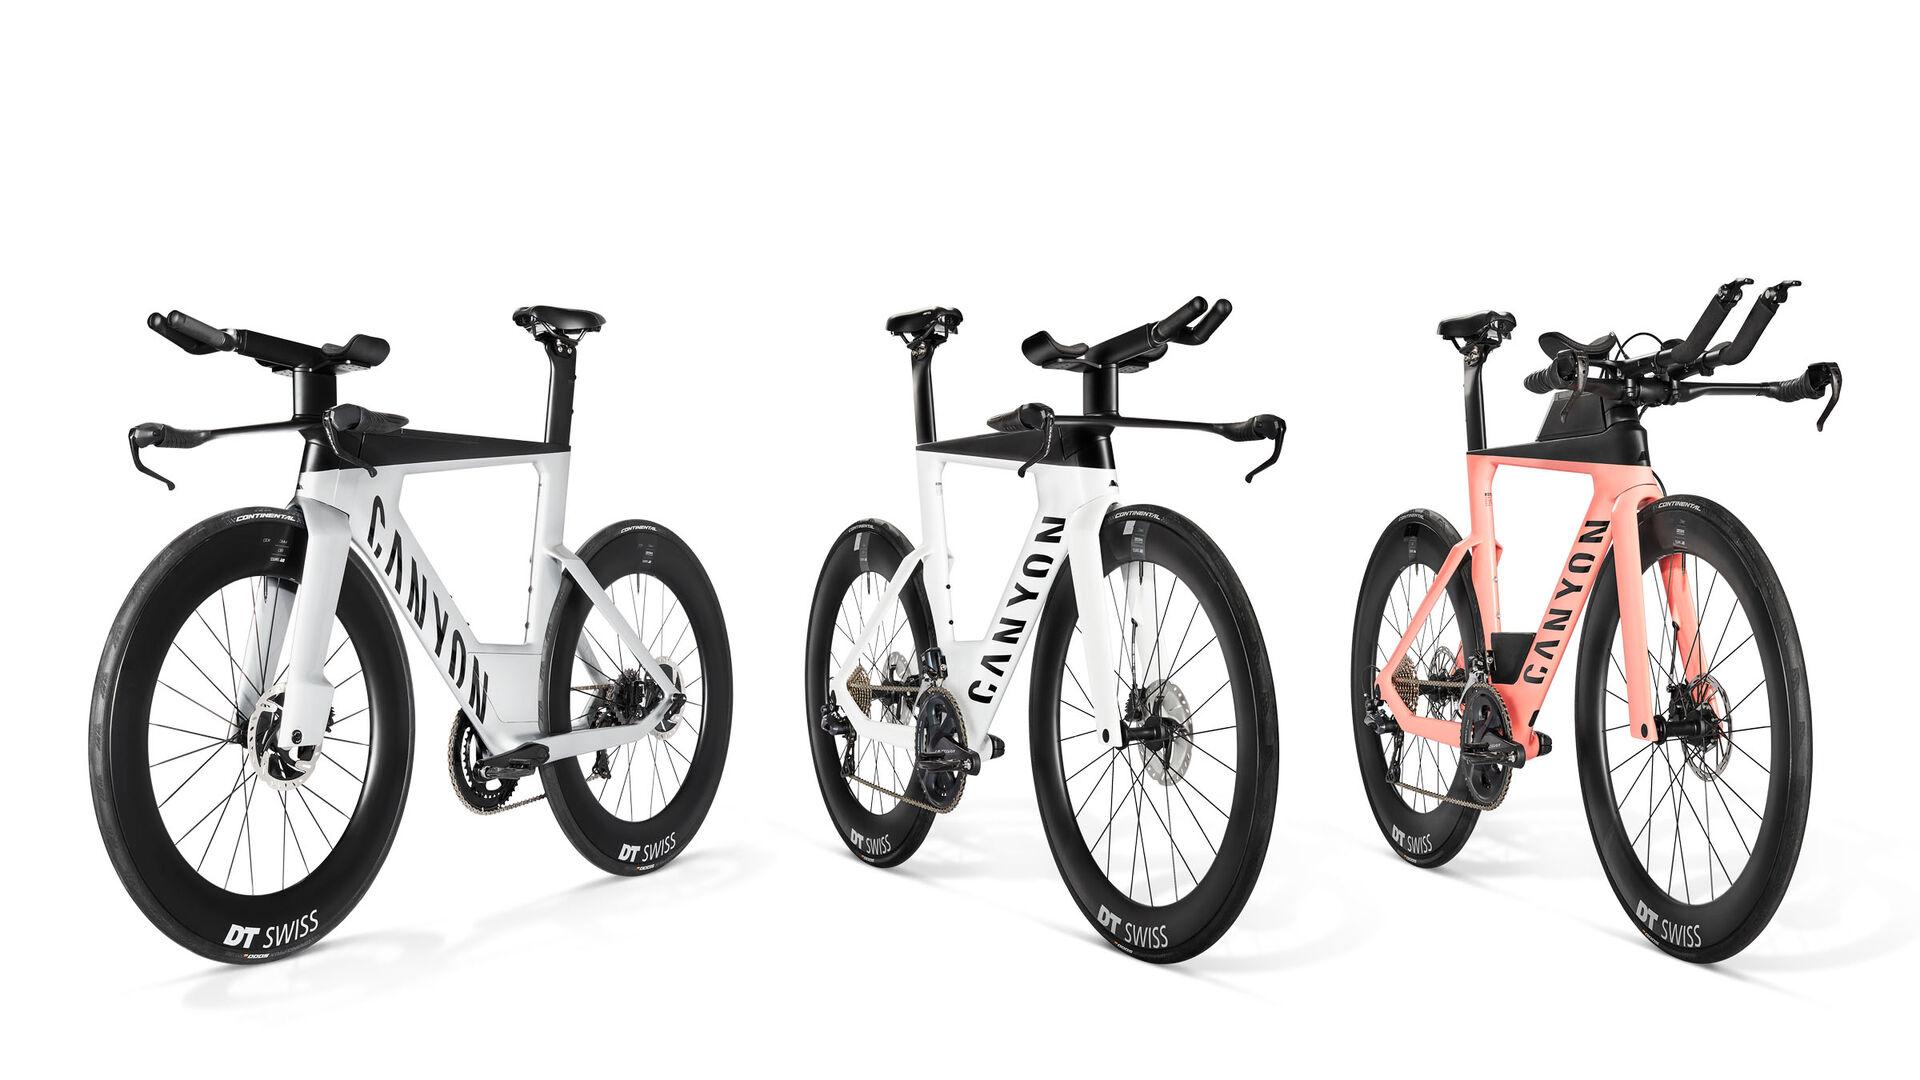 Canyon Speedmax triathlon bikes